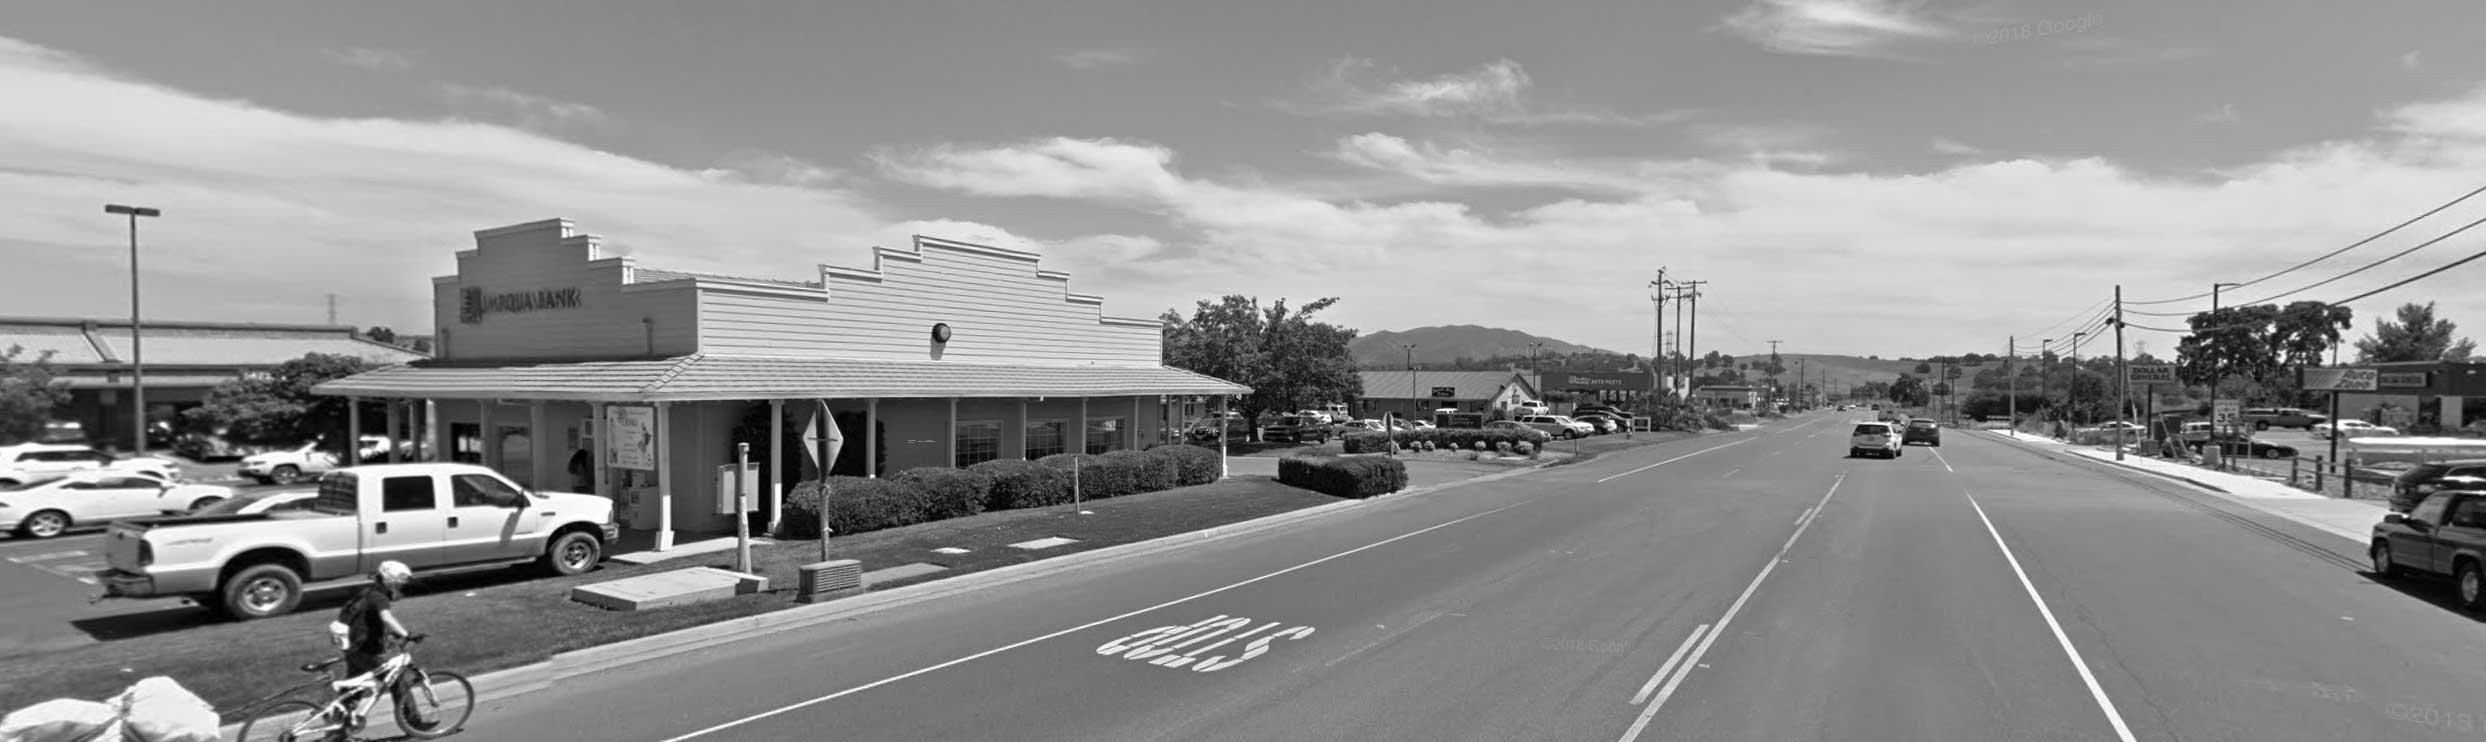 Shop Valley Springs